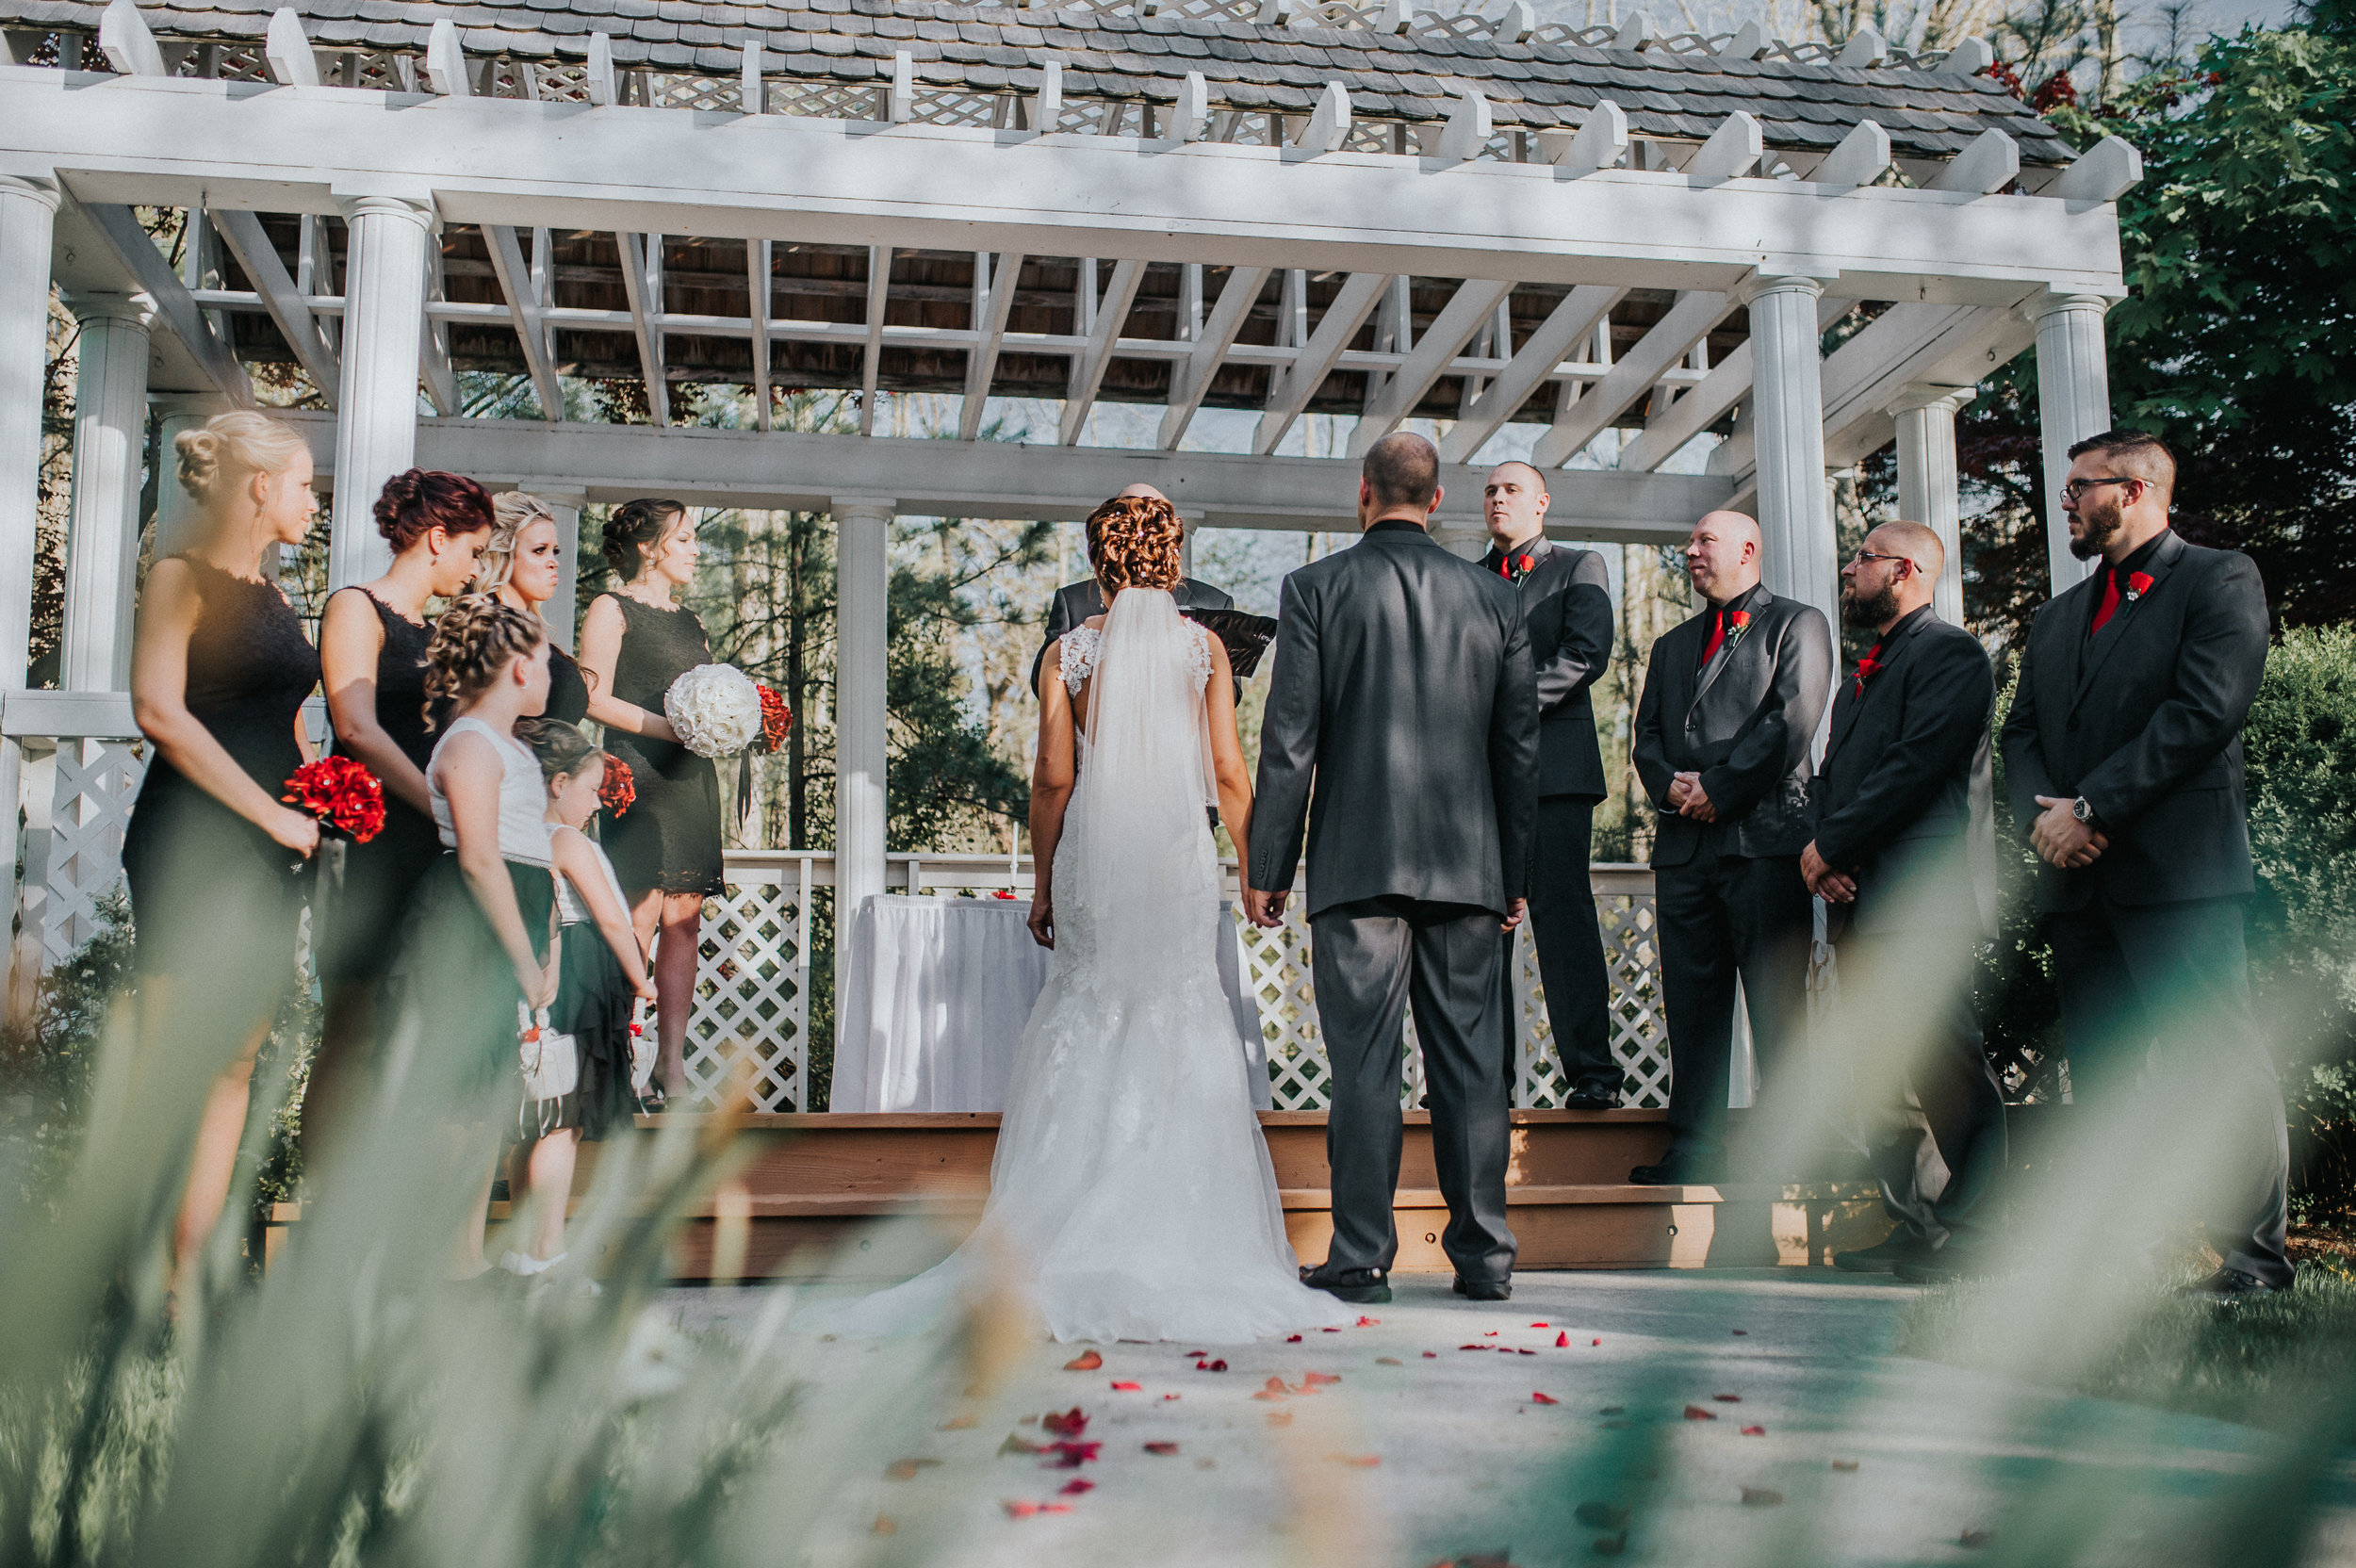 Christina-and-Gene-Wedding-Marla-Rain-Photography-328.jpg